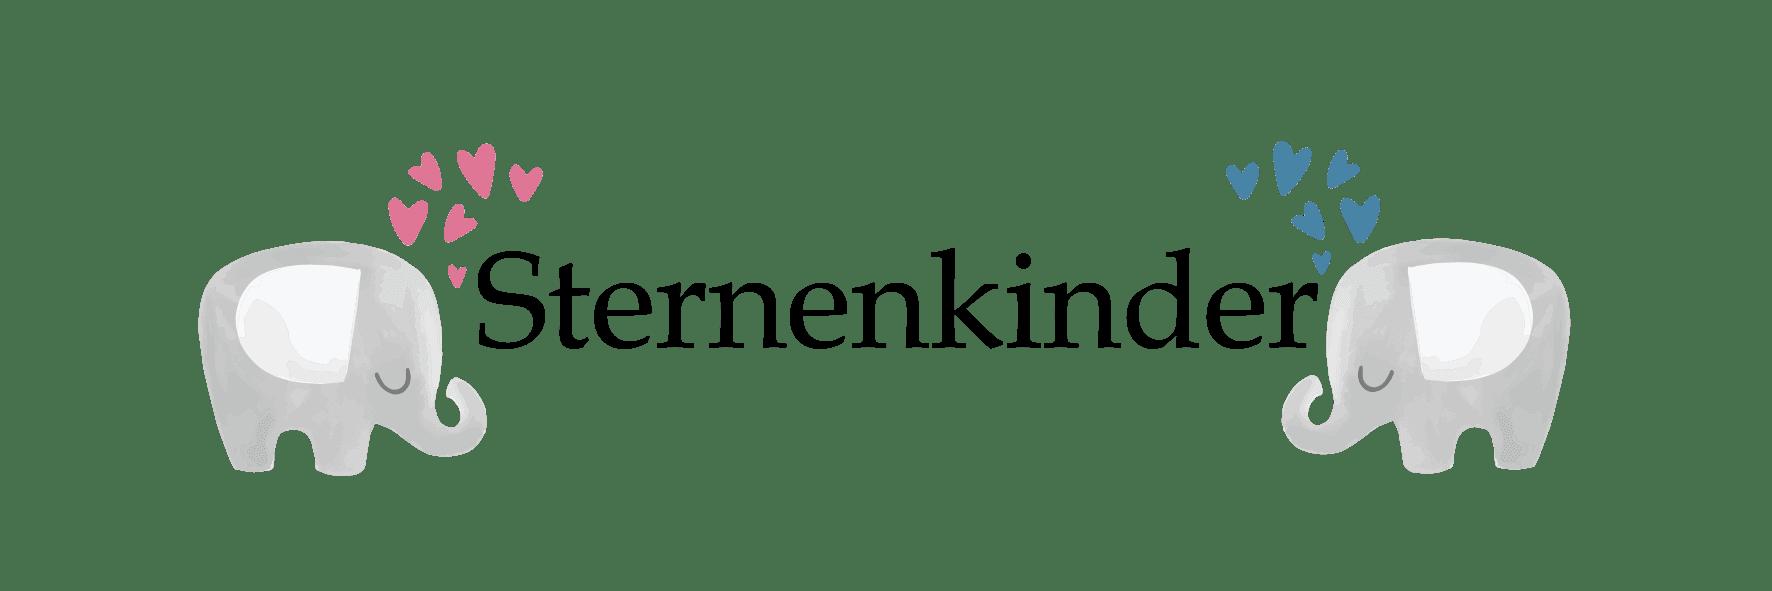 Kollektion Sternenkinder